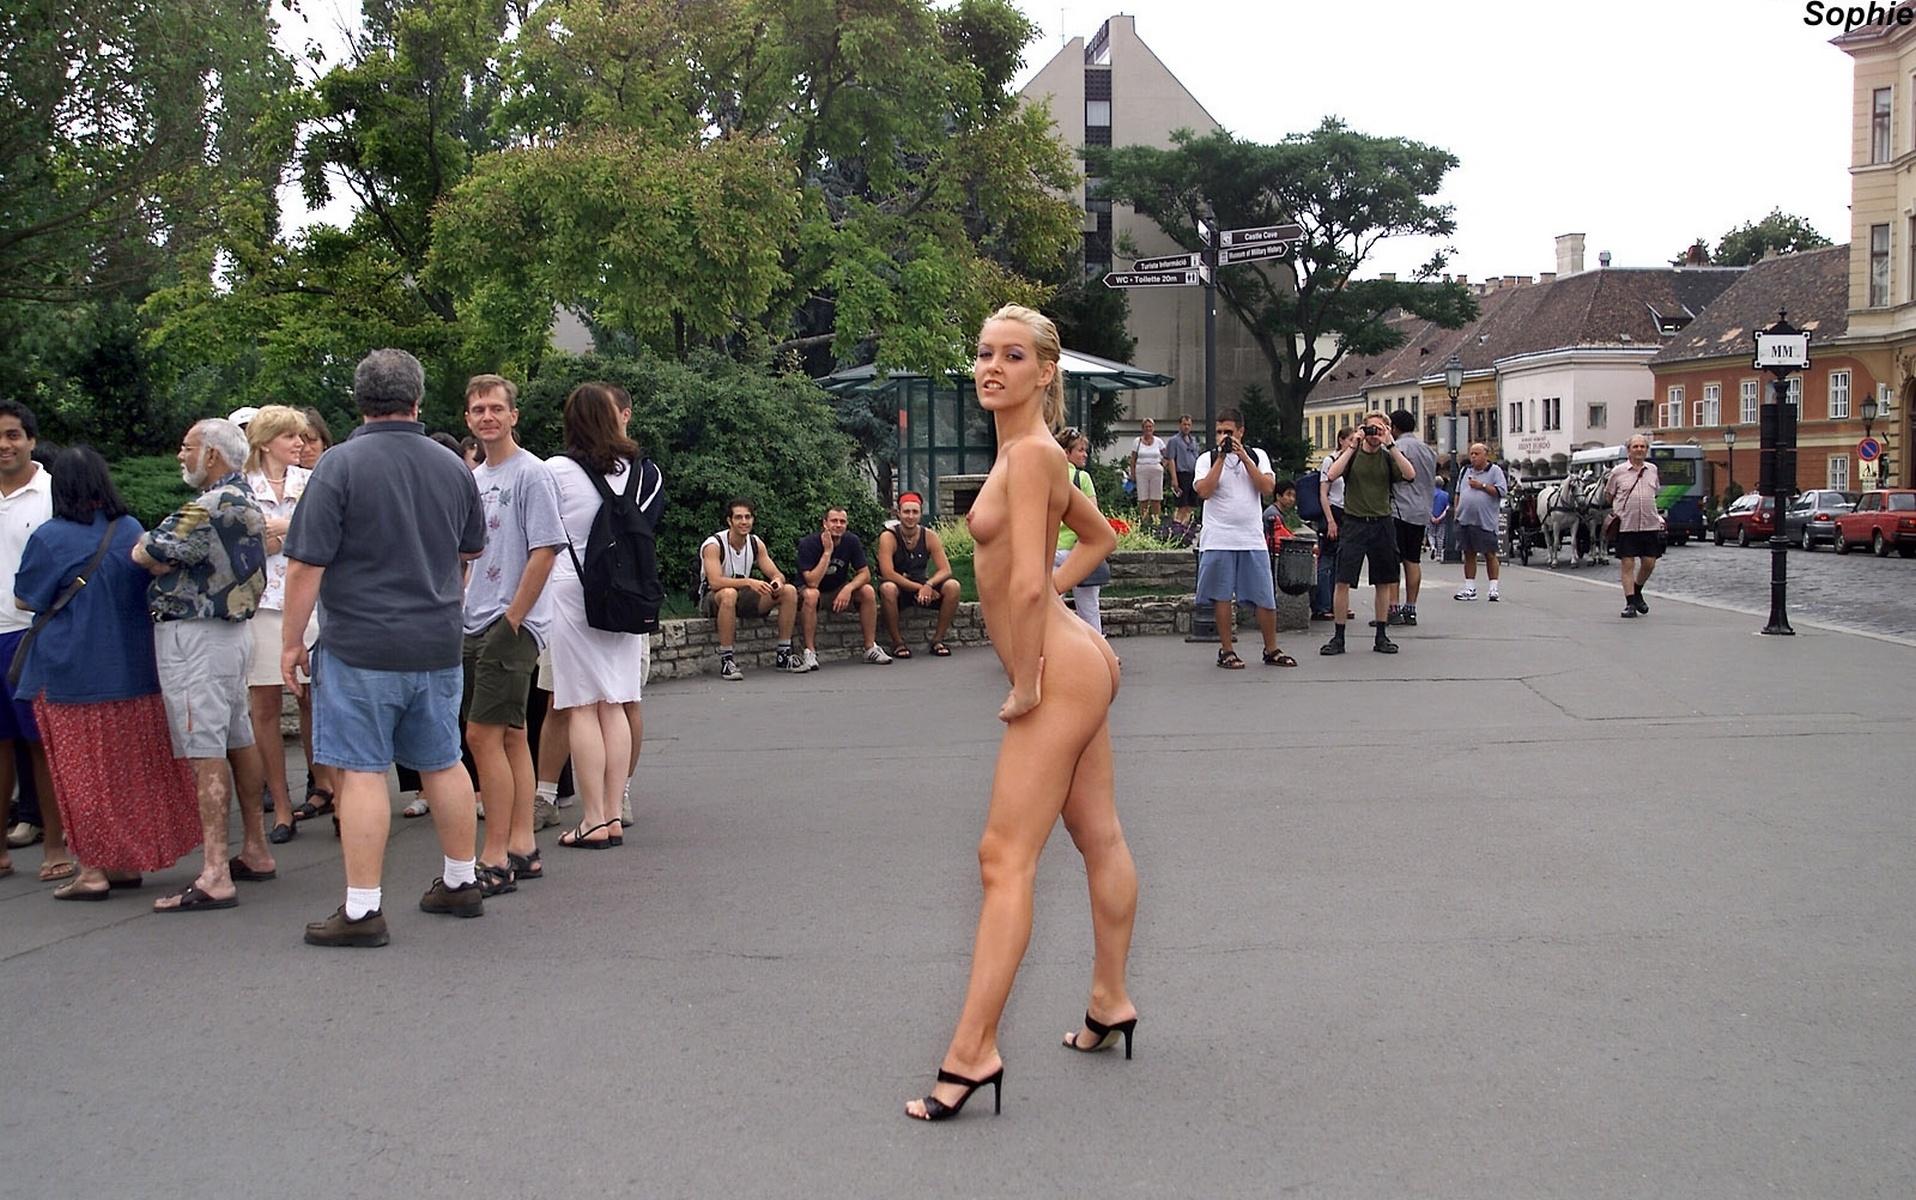 Sophie Nude In Public 108